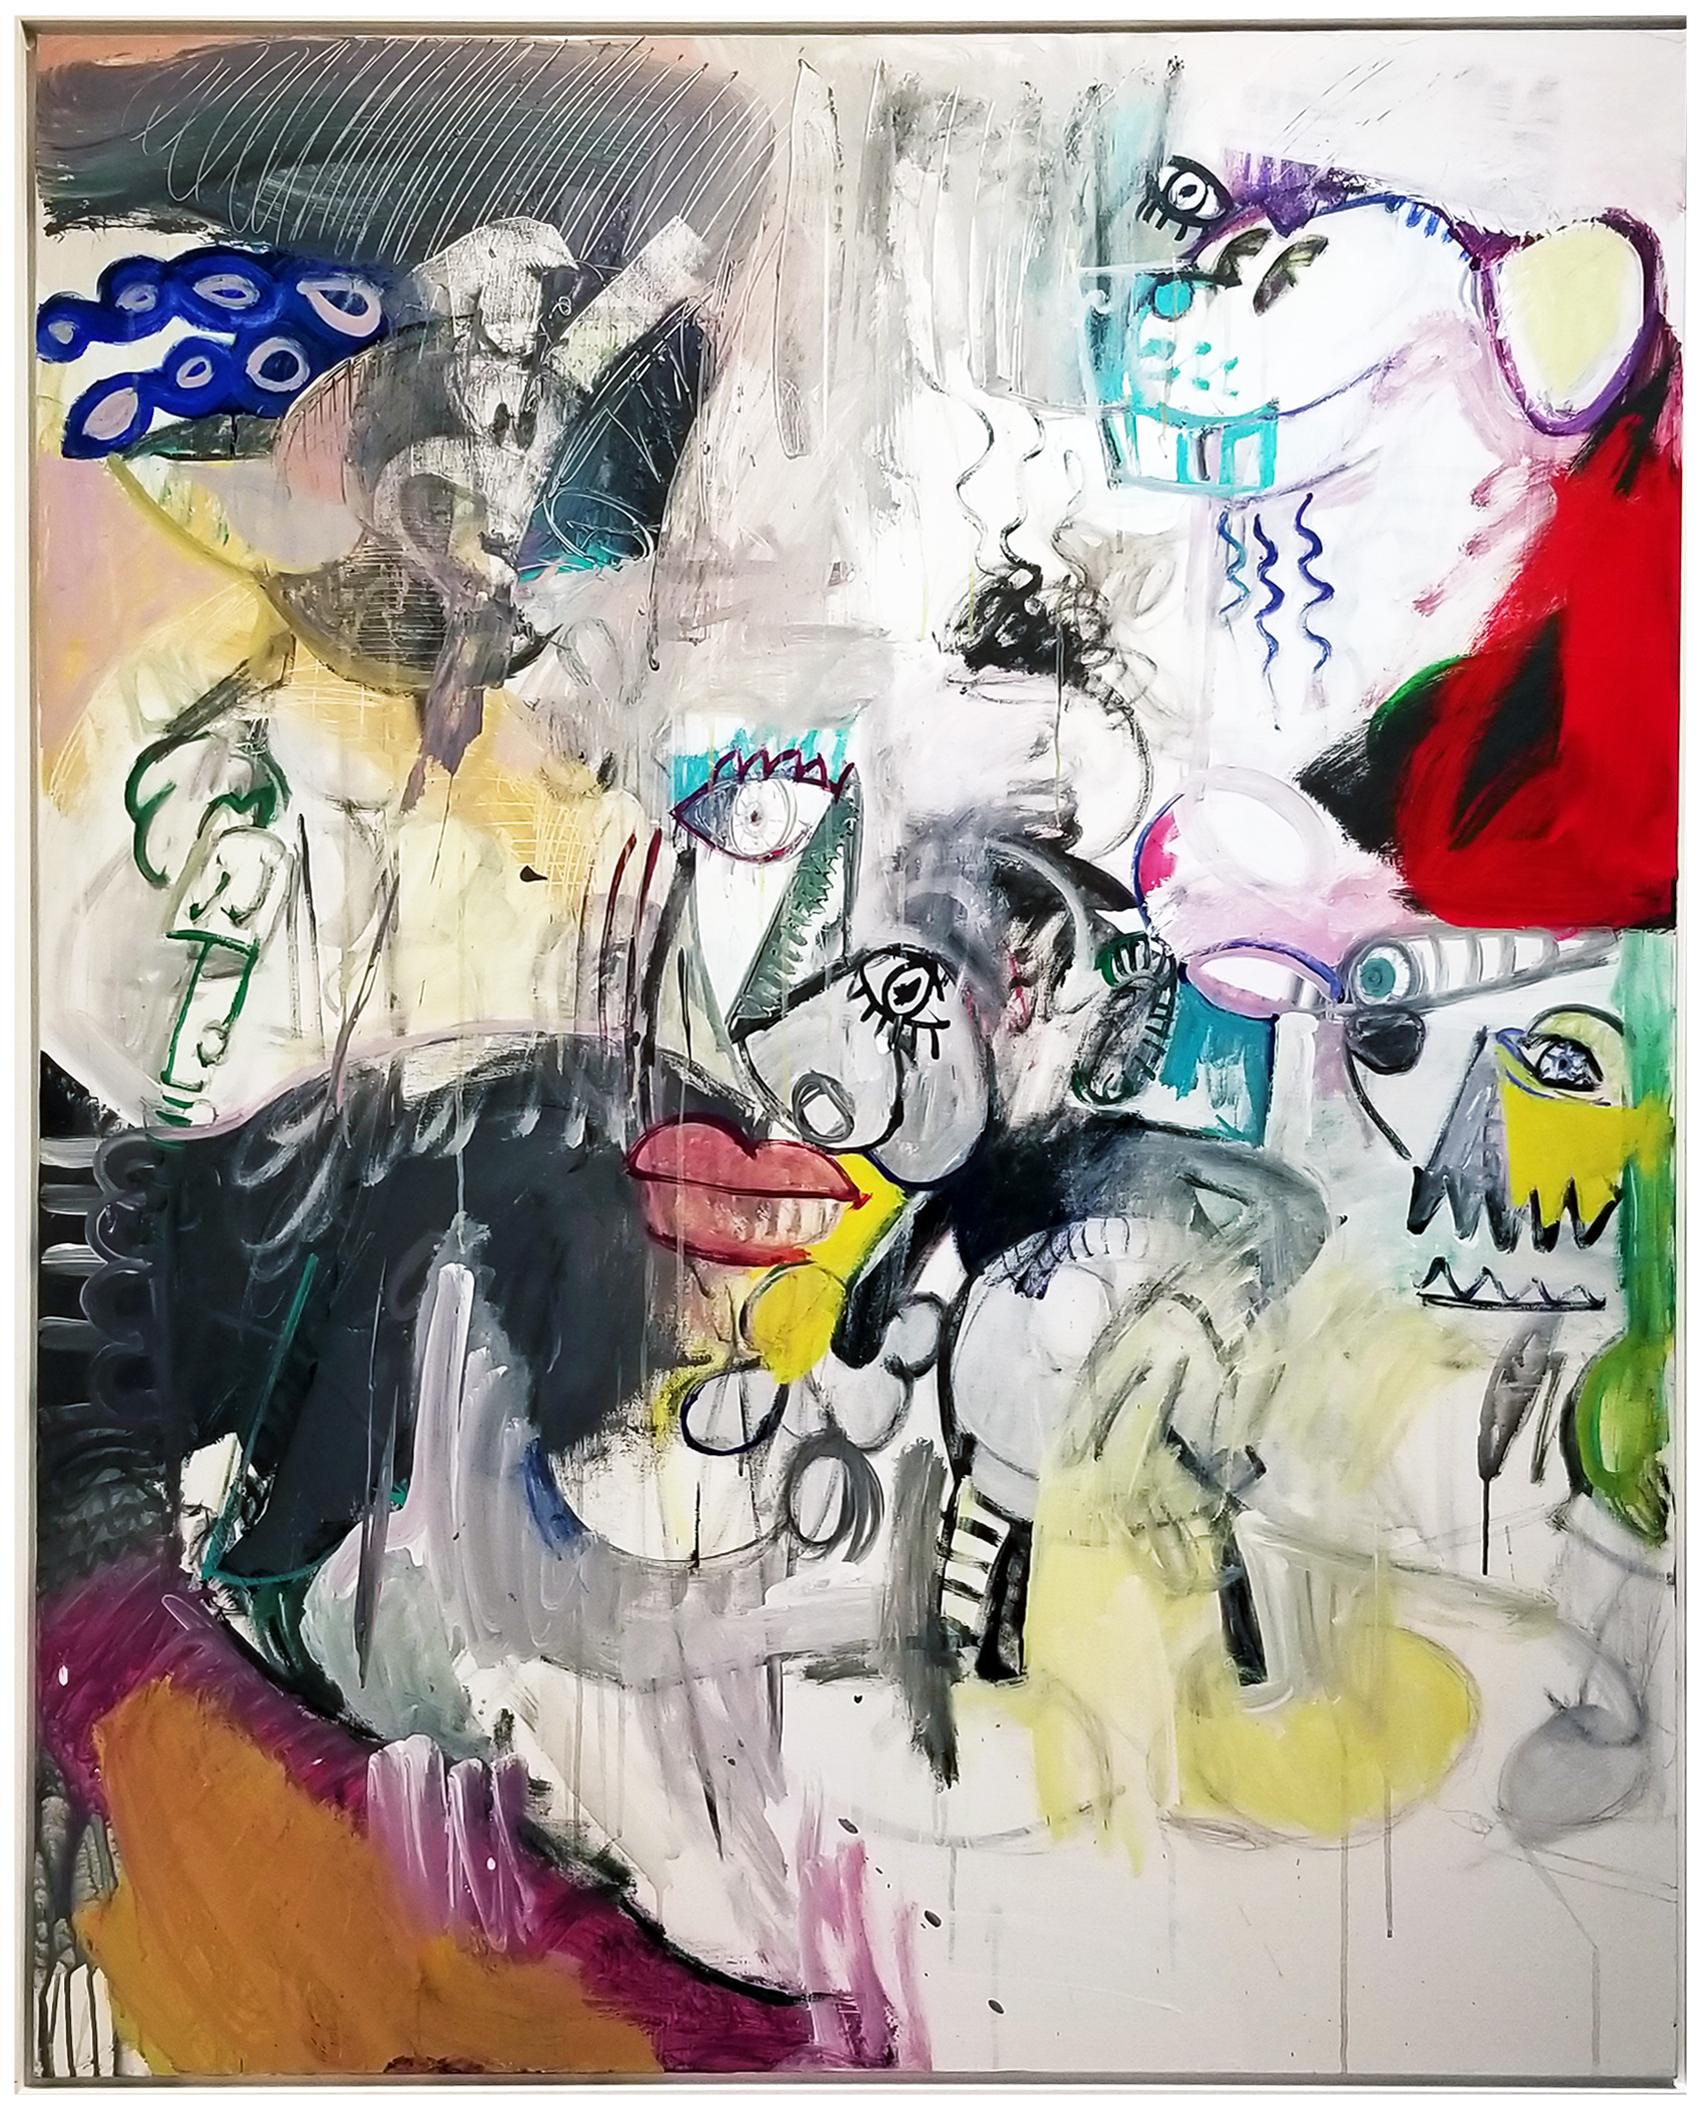 "Untitled#86, 2018, acrylic on canvas, 60"" x 48"" (152.4 x 122 cm)"